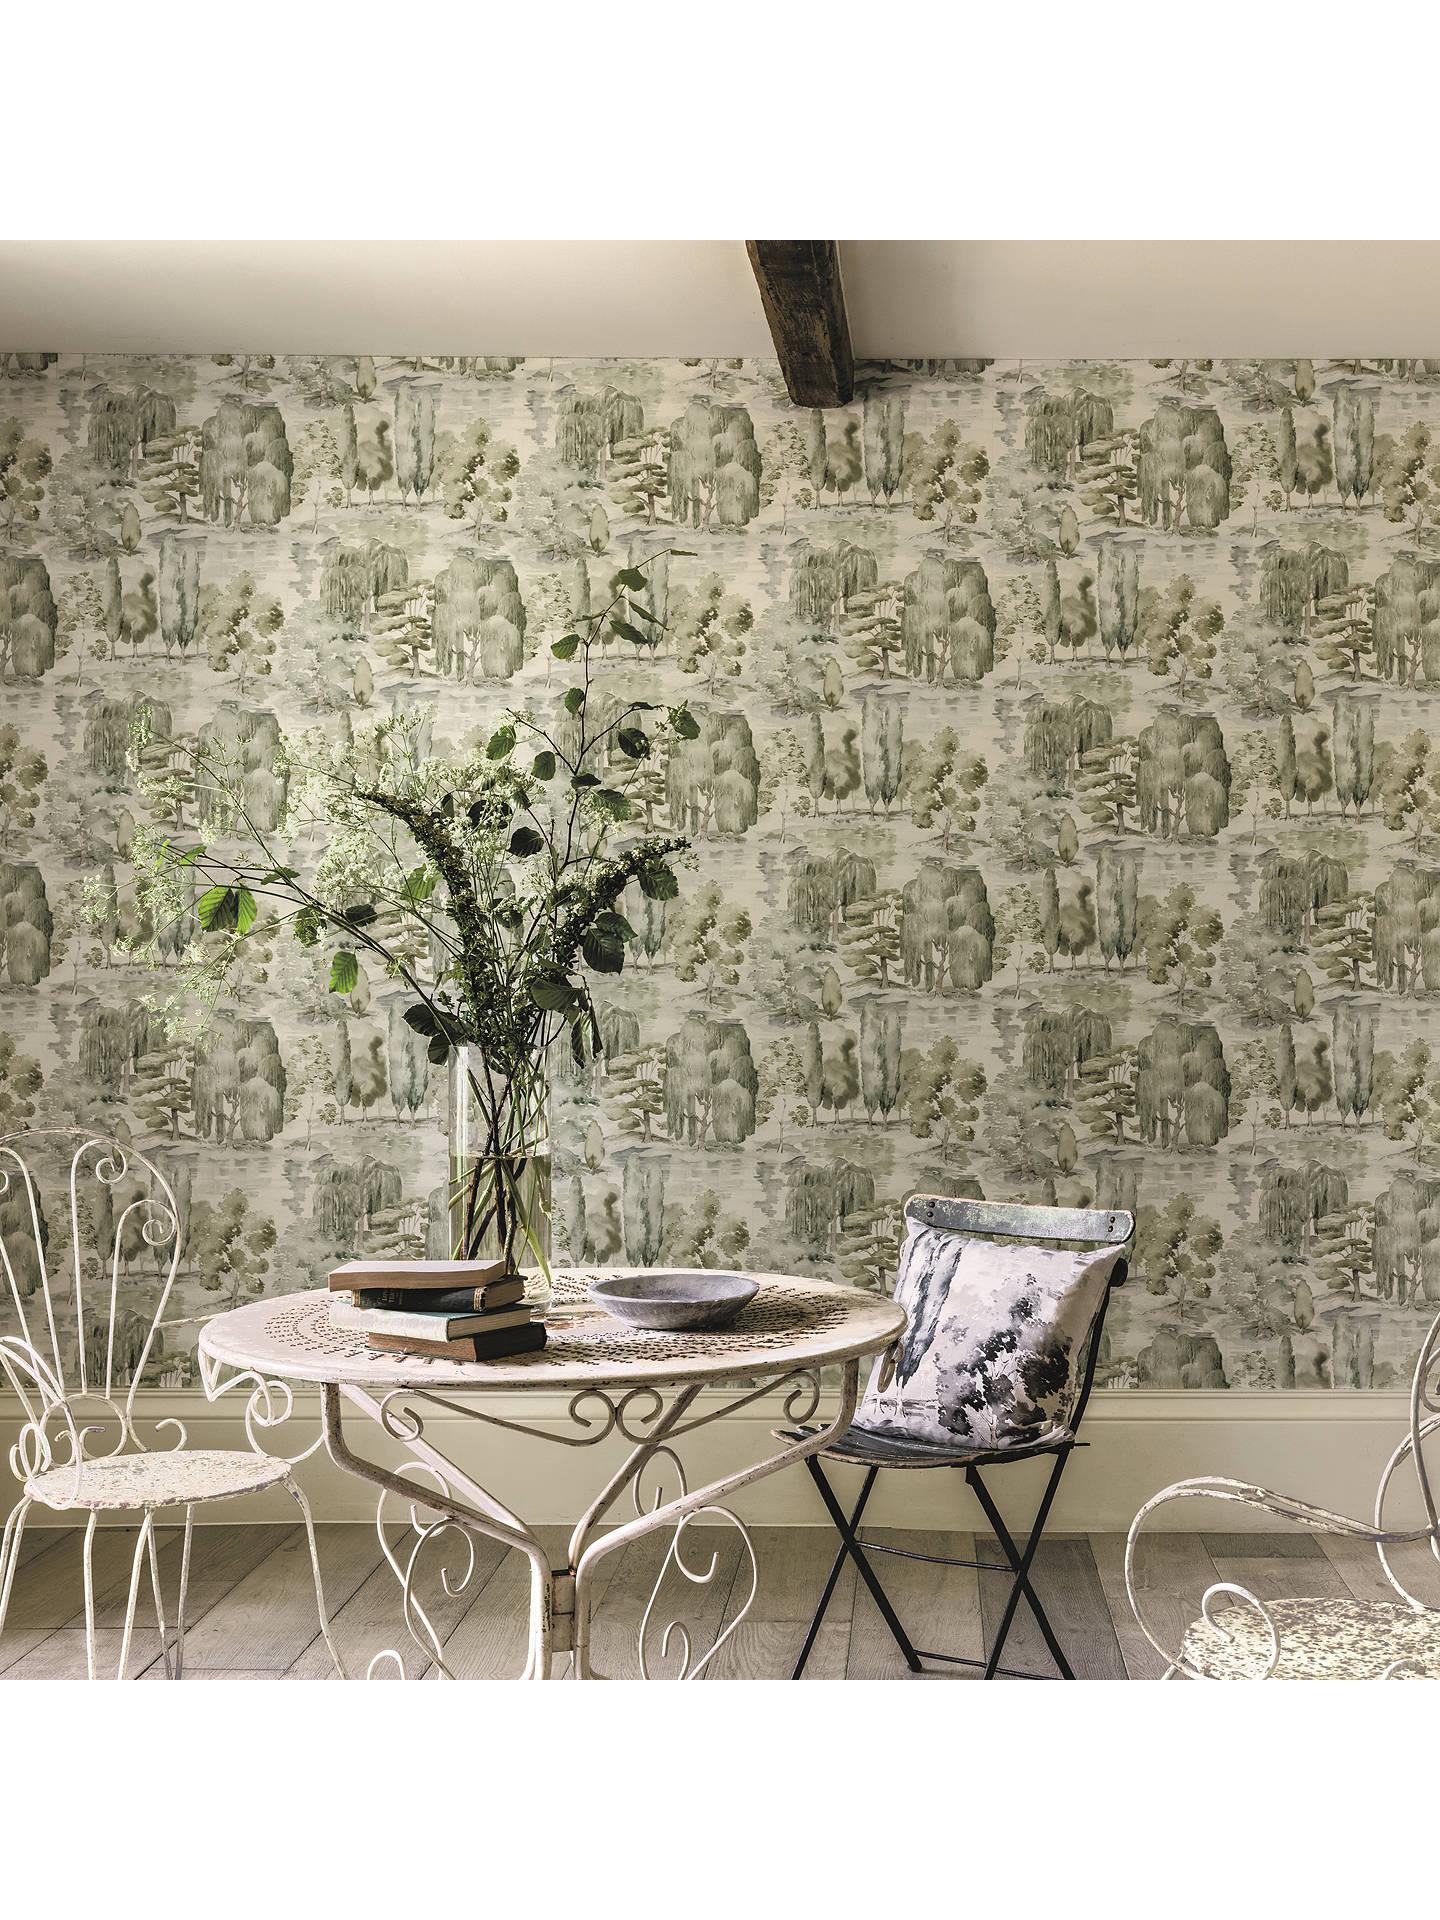 ... Buy Sanderson Waterperry Wallpaper, Willow / Olive DWAP216283 Online at johnlewis.com